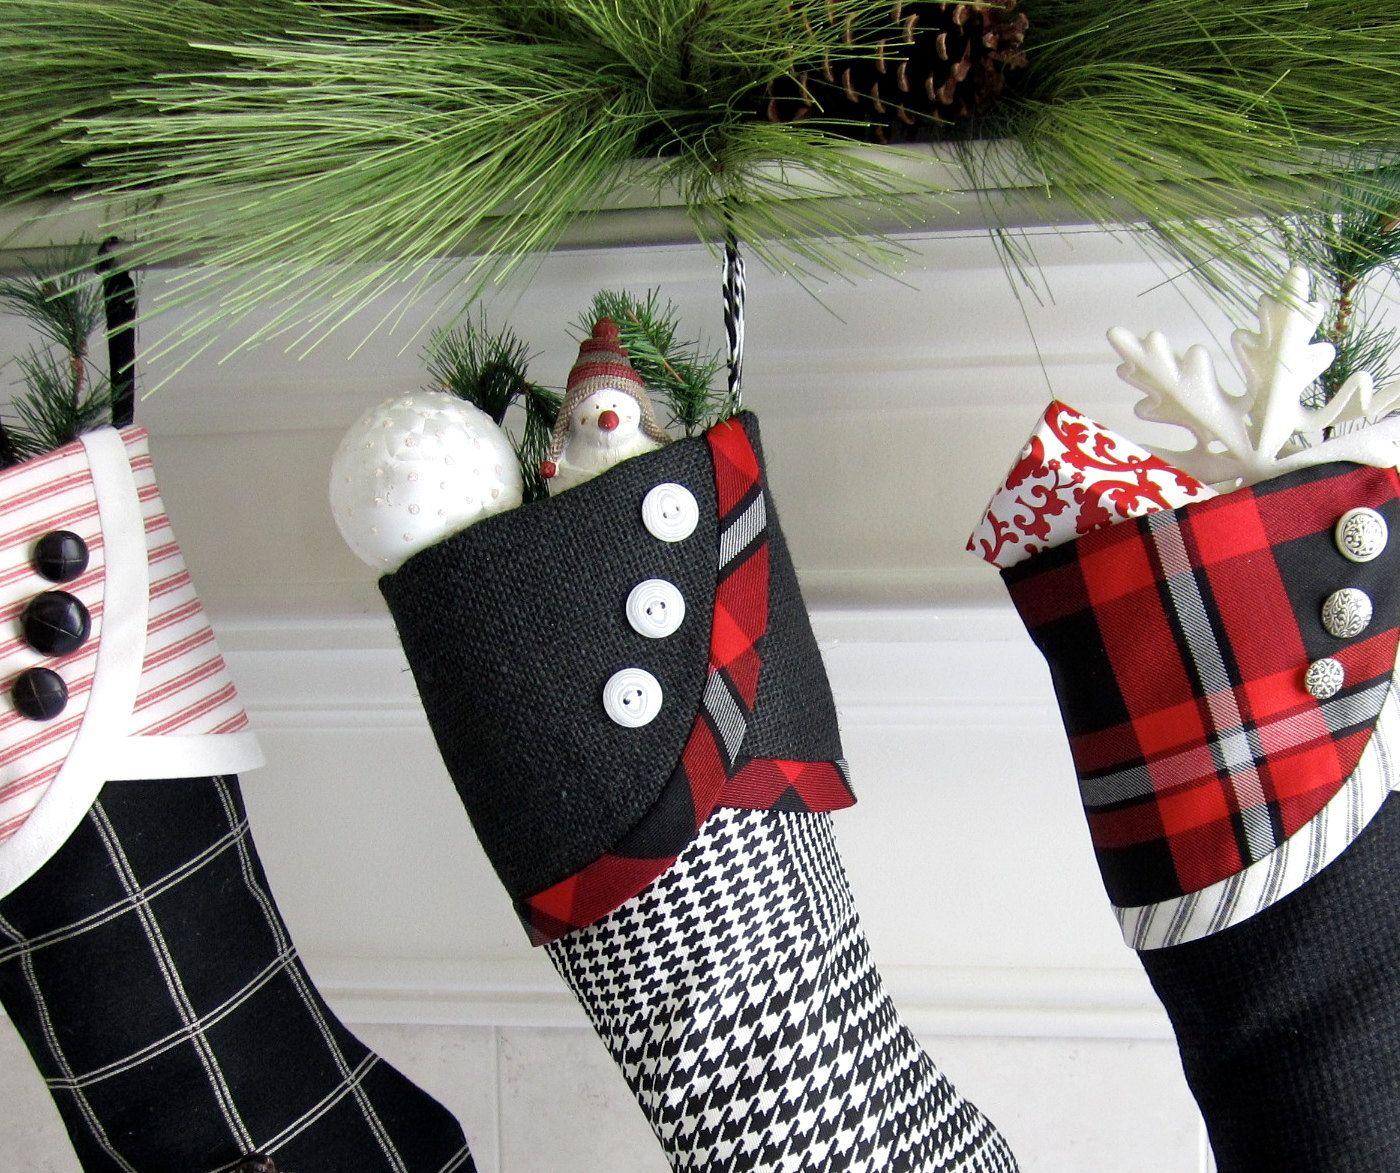 Black And White Christmas Stockings.No 2 Christmas Stocking Black White And A Little Red